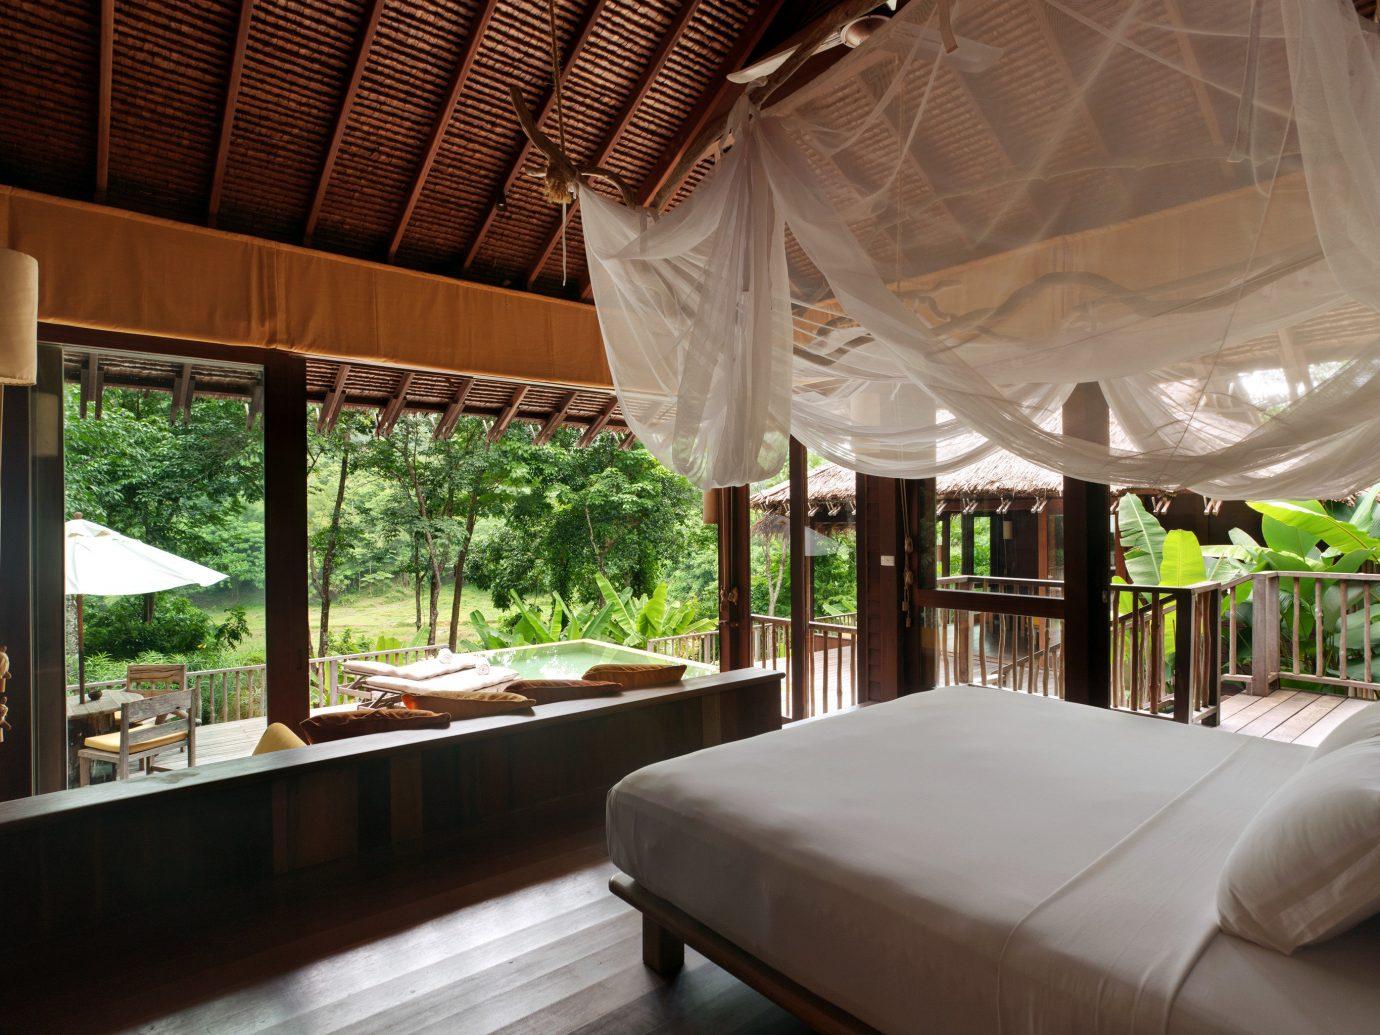 Beach Bedroom Hip Hotels Luxury Modern Phuket Romantic Scenic views Suite Thailand indoor floor property room Resort estate interior design Villa restaurant mansion furniture